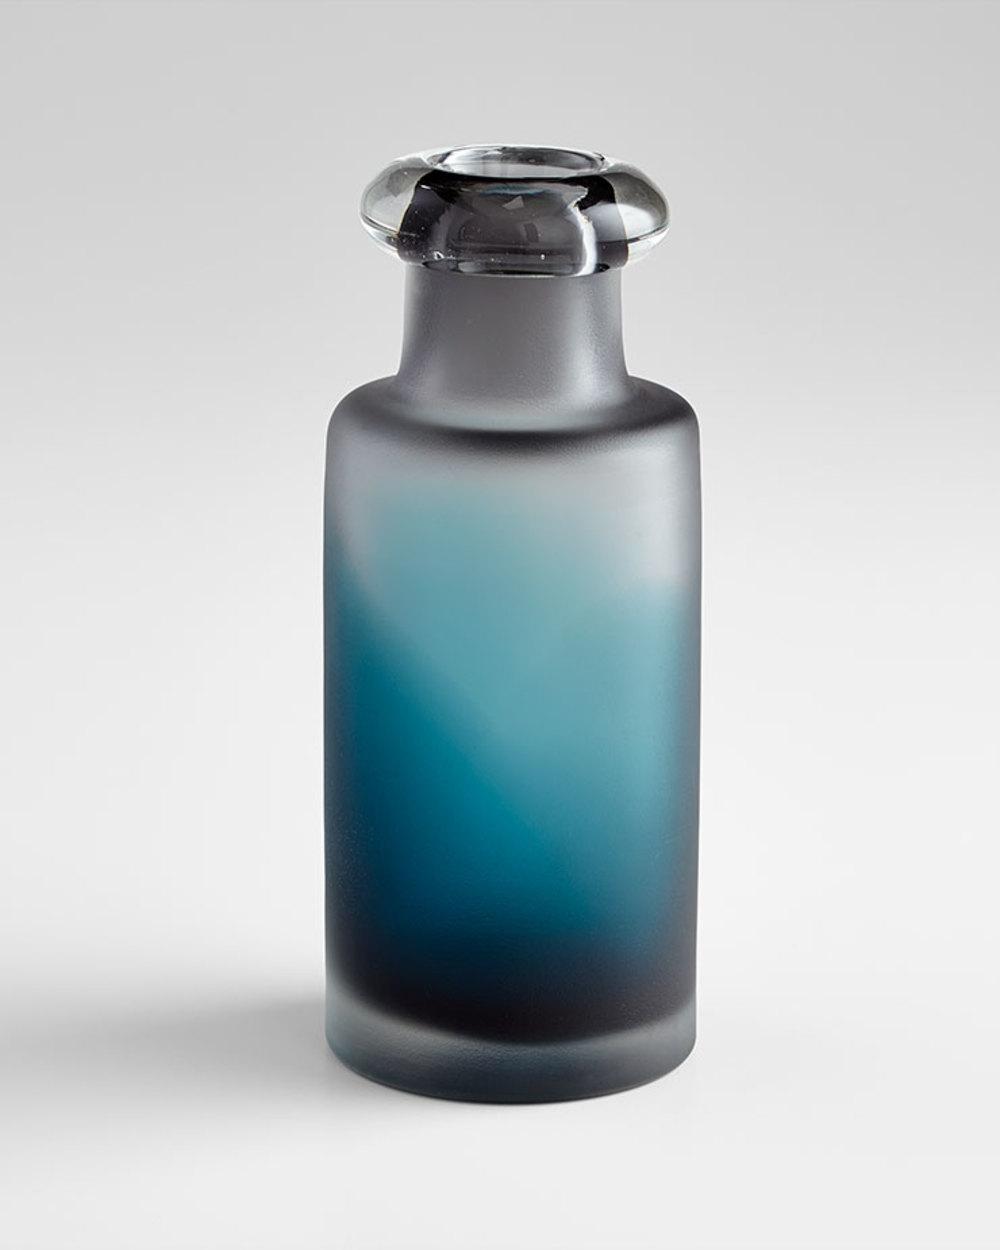 Cyan Designs - Small Neptune Vase